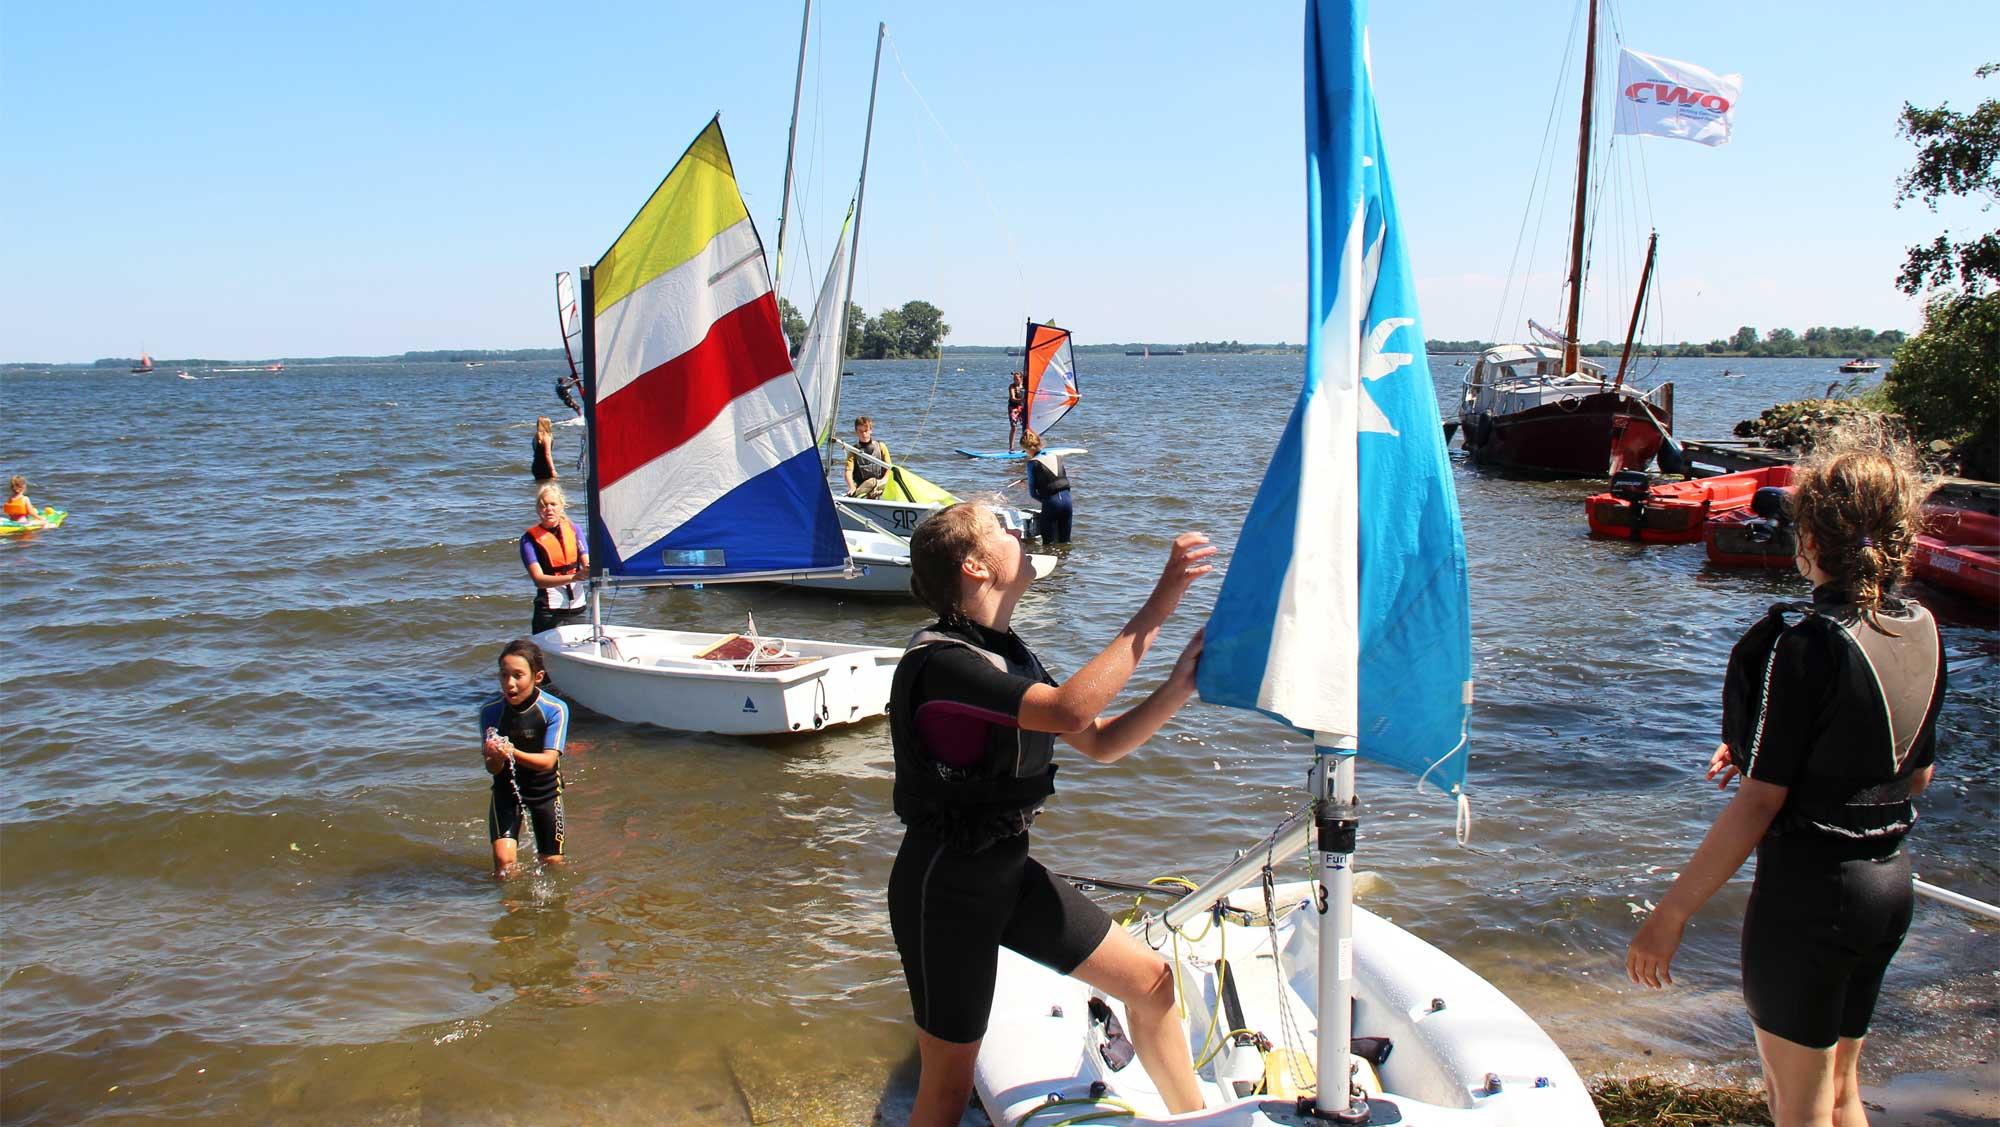 Zeilschool De Randmeren Molecaten Park Flevostrand 05 zeilles Veluwemeer